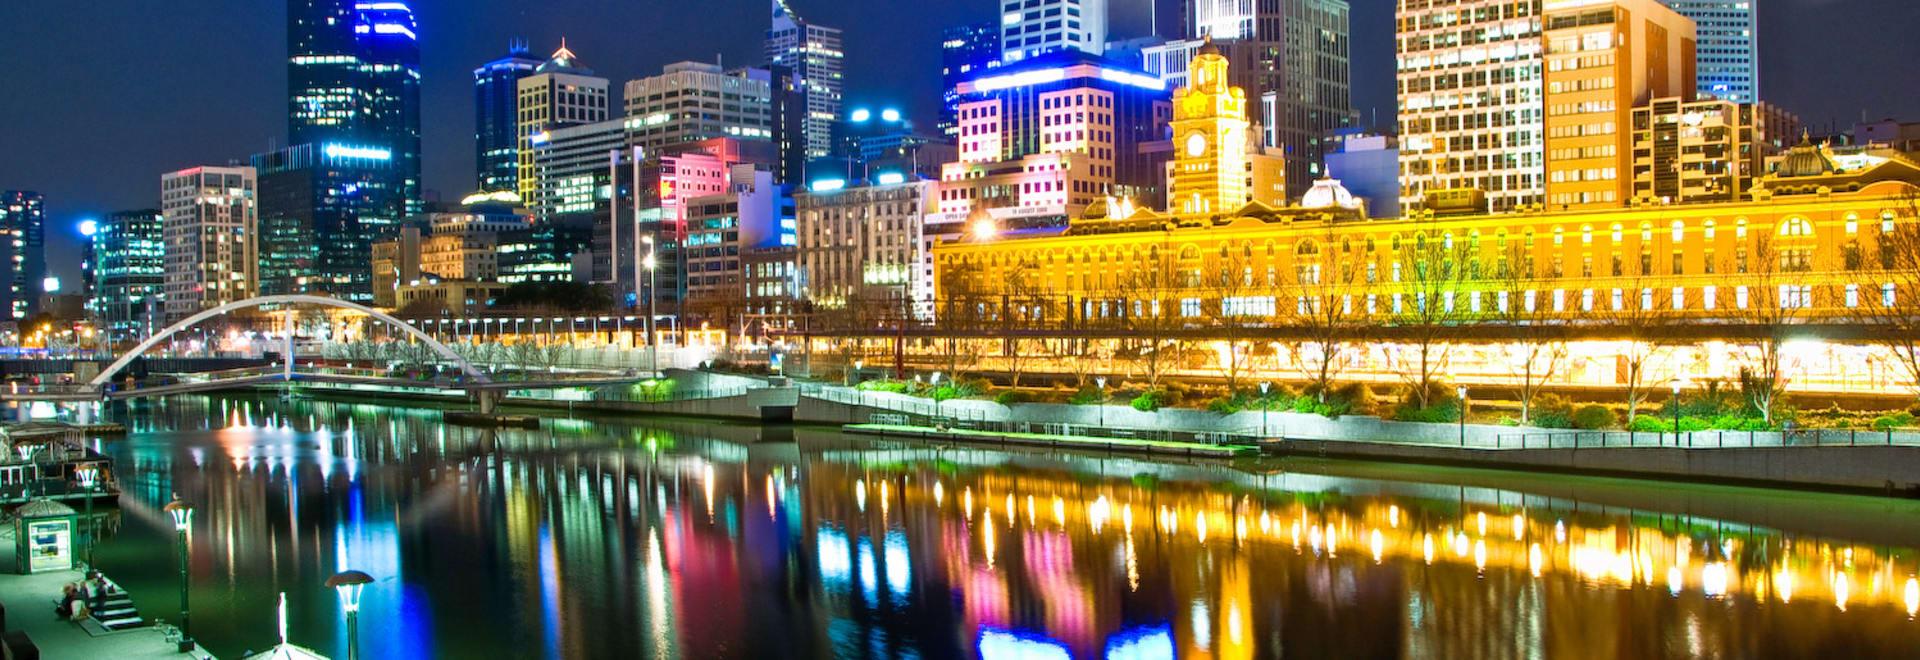 1493122418_melbourne__australia_by_night.jpg